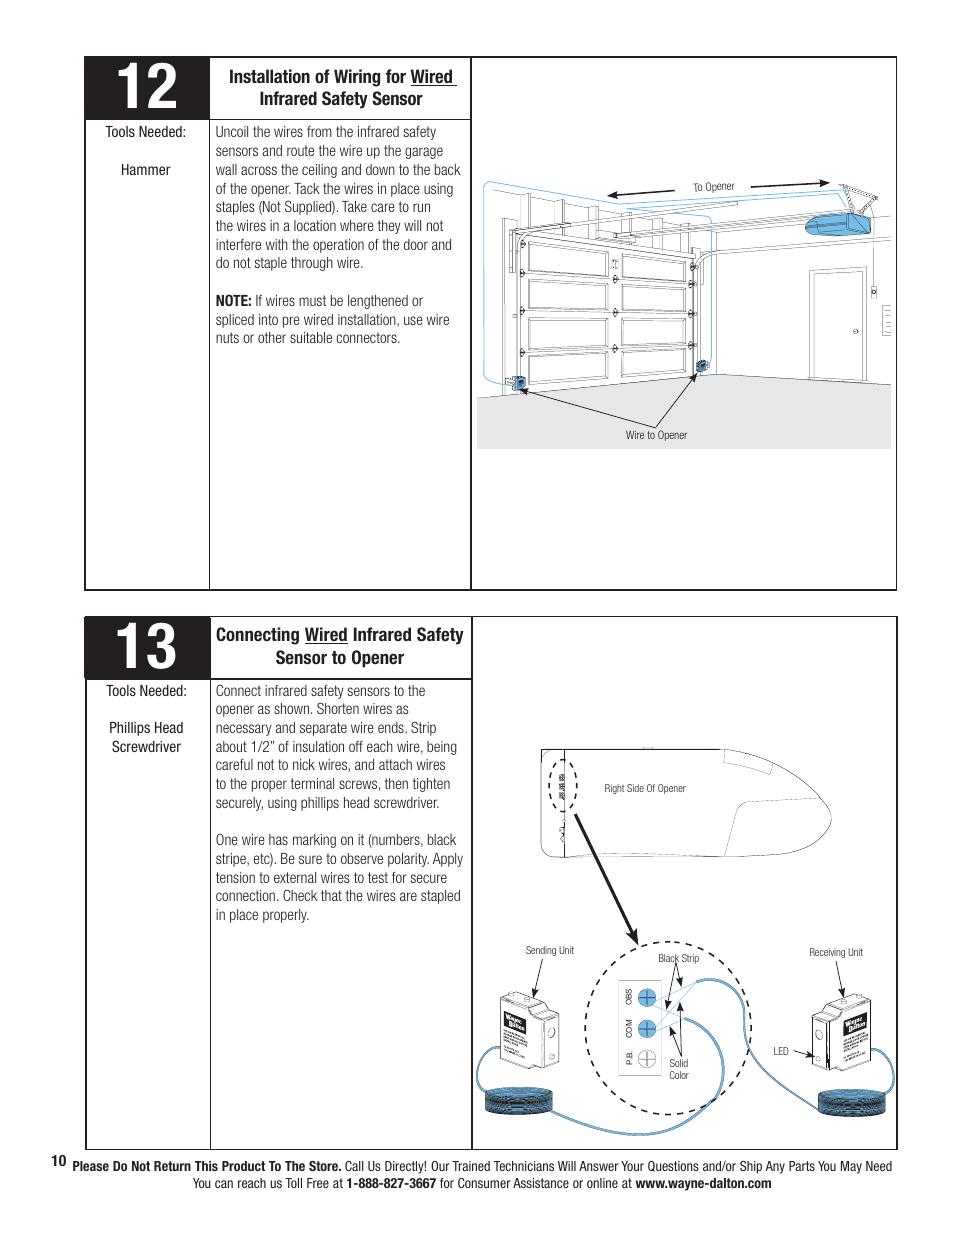 medium resolution of wayne dalton prodrive 3222c z user manual page 16 48 also for wayne dalton idrive wiring diagram wayne dalton wiring diagram